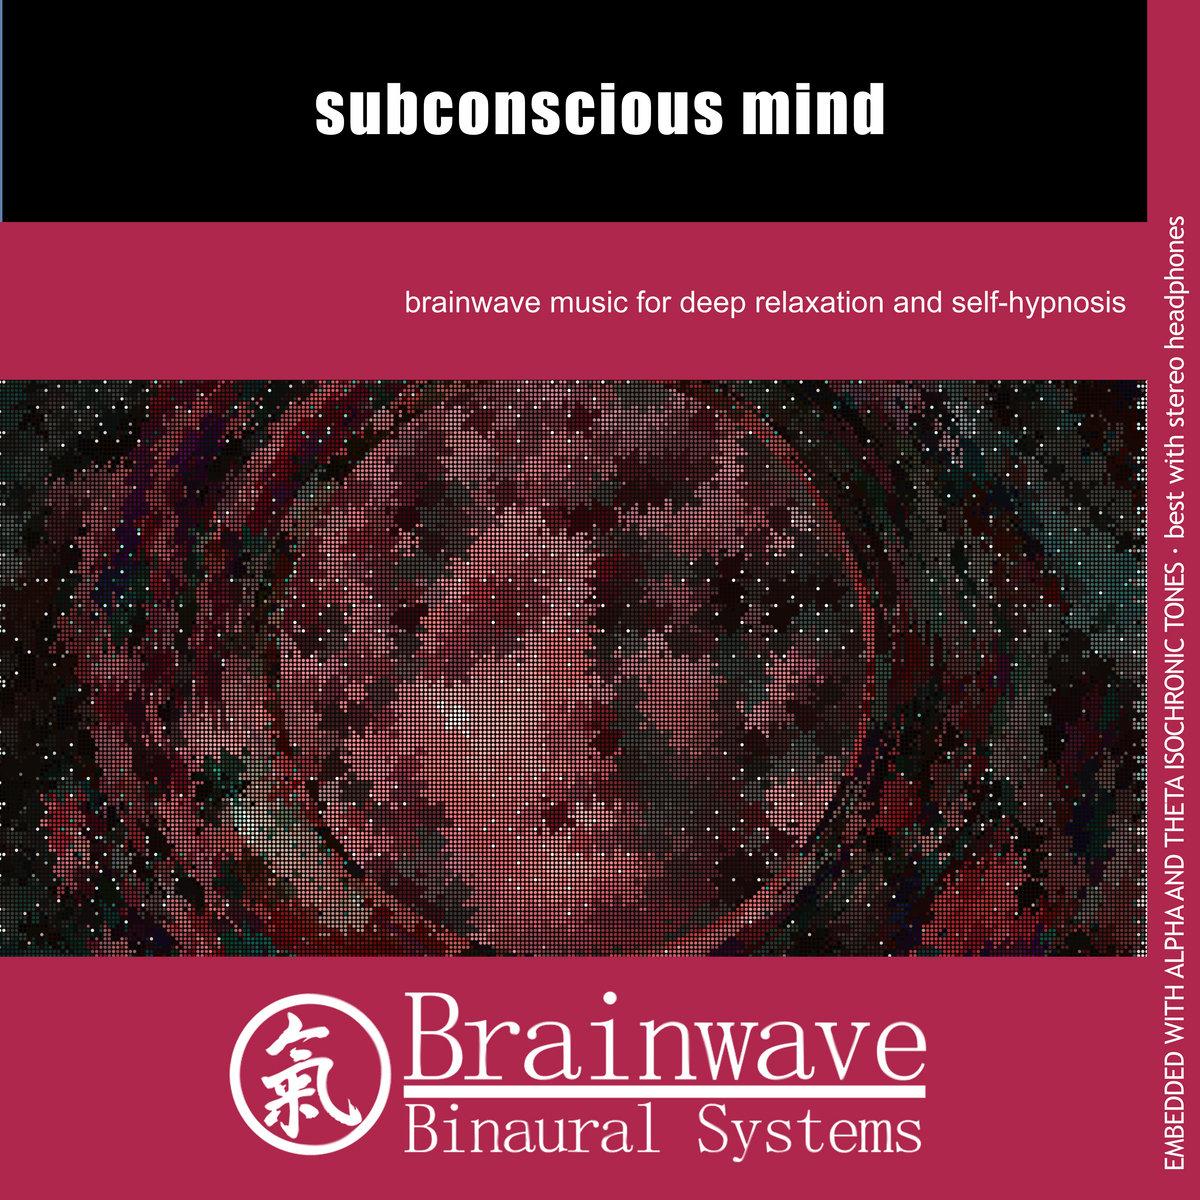 Subconscious Mind | Brainwave Binaural Systems